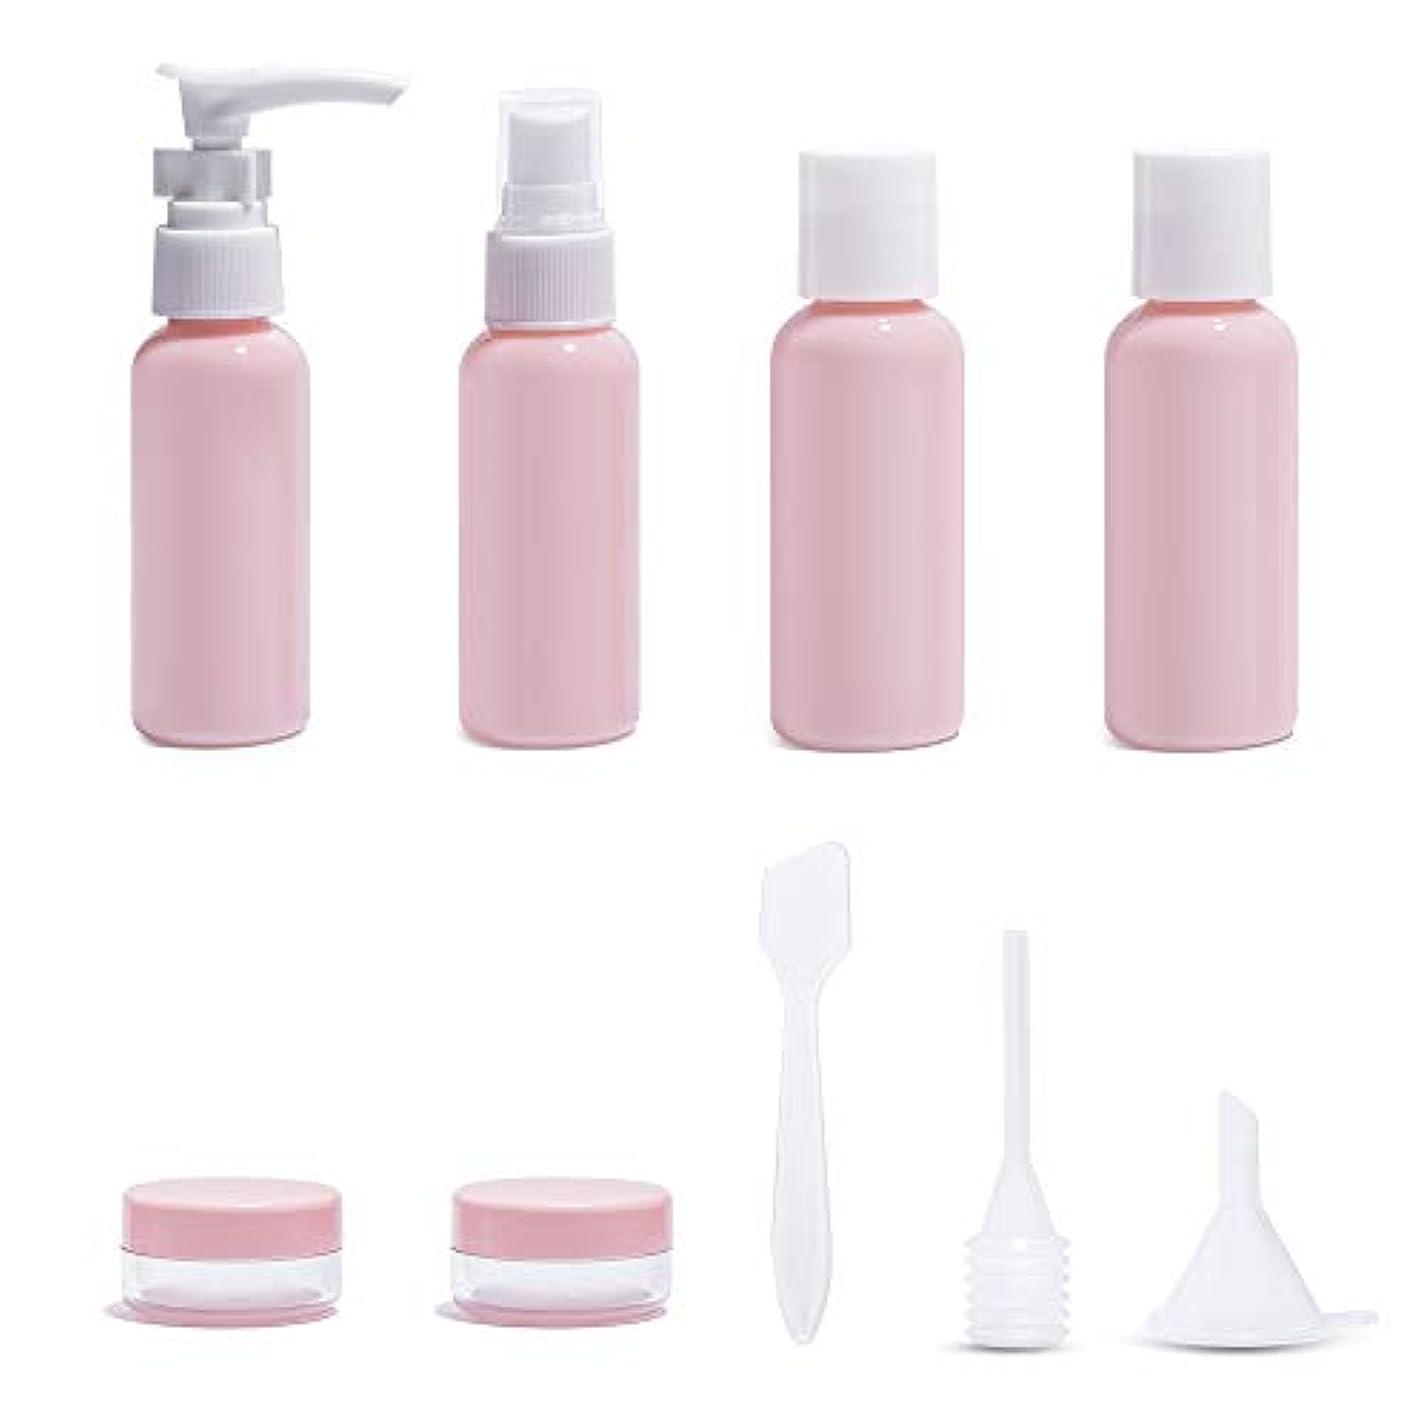 Diolan トラベルボトル 小分けボトル コスメ用詰替え容器 6本セット ピンク 旅行 出張